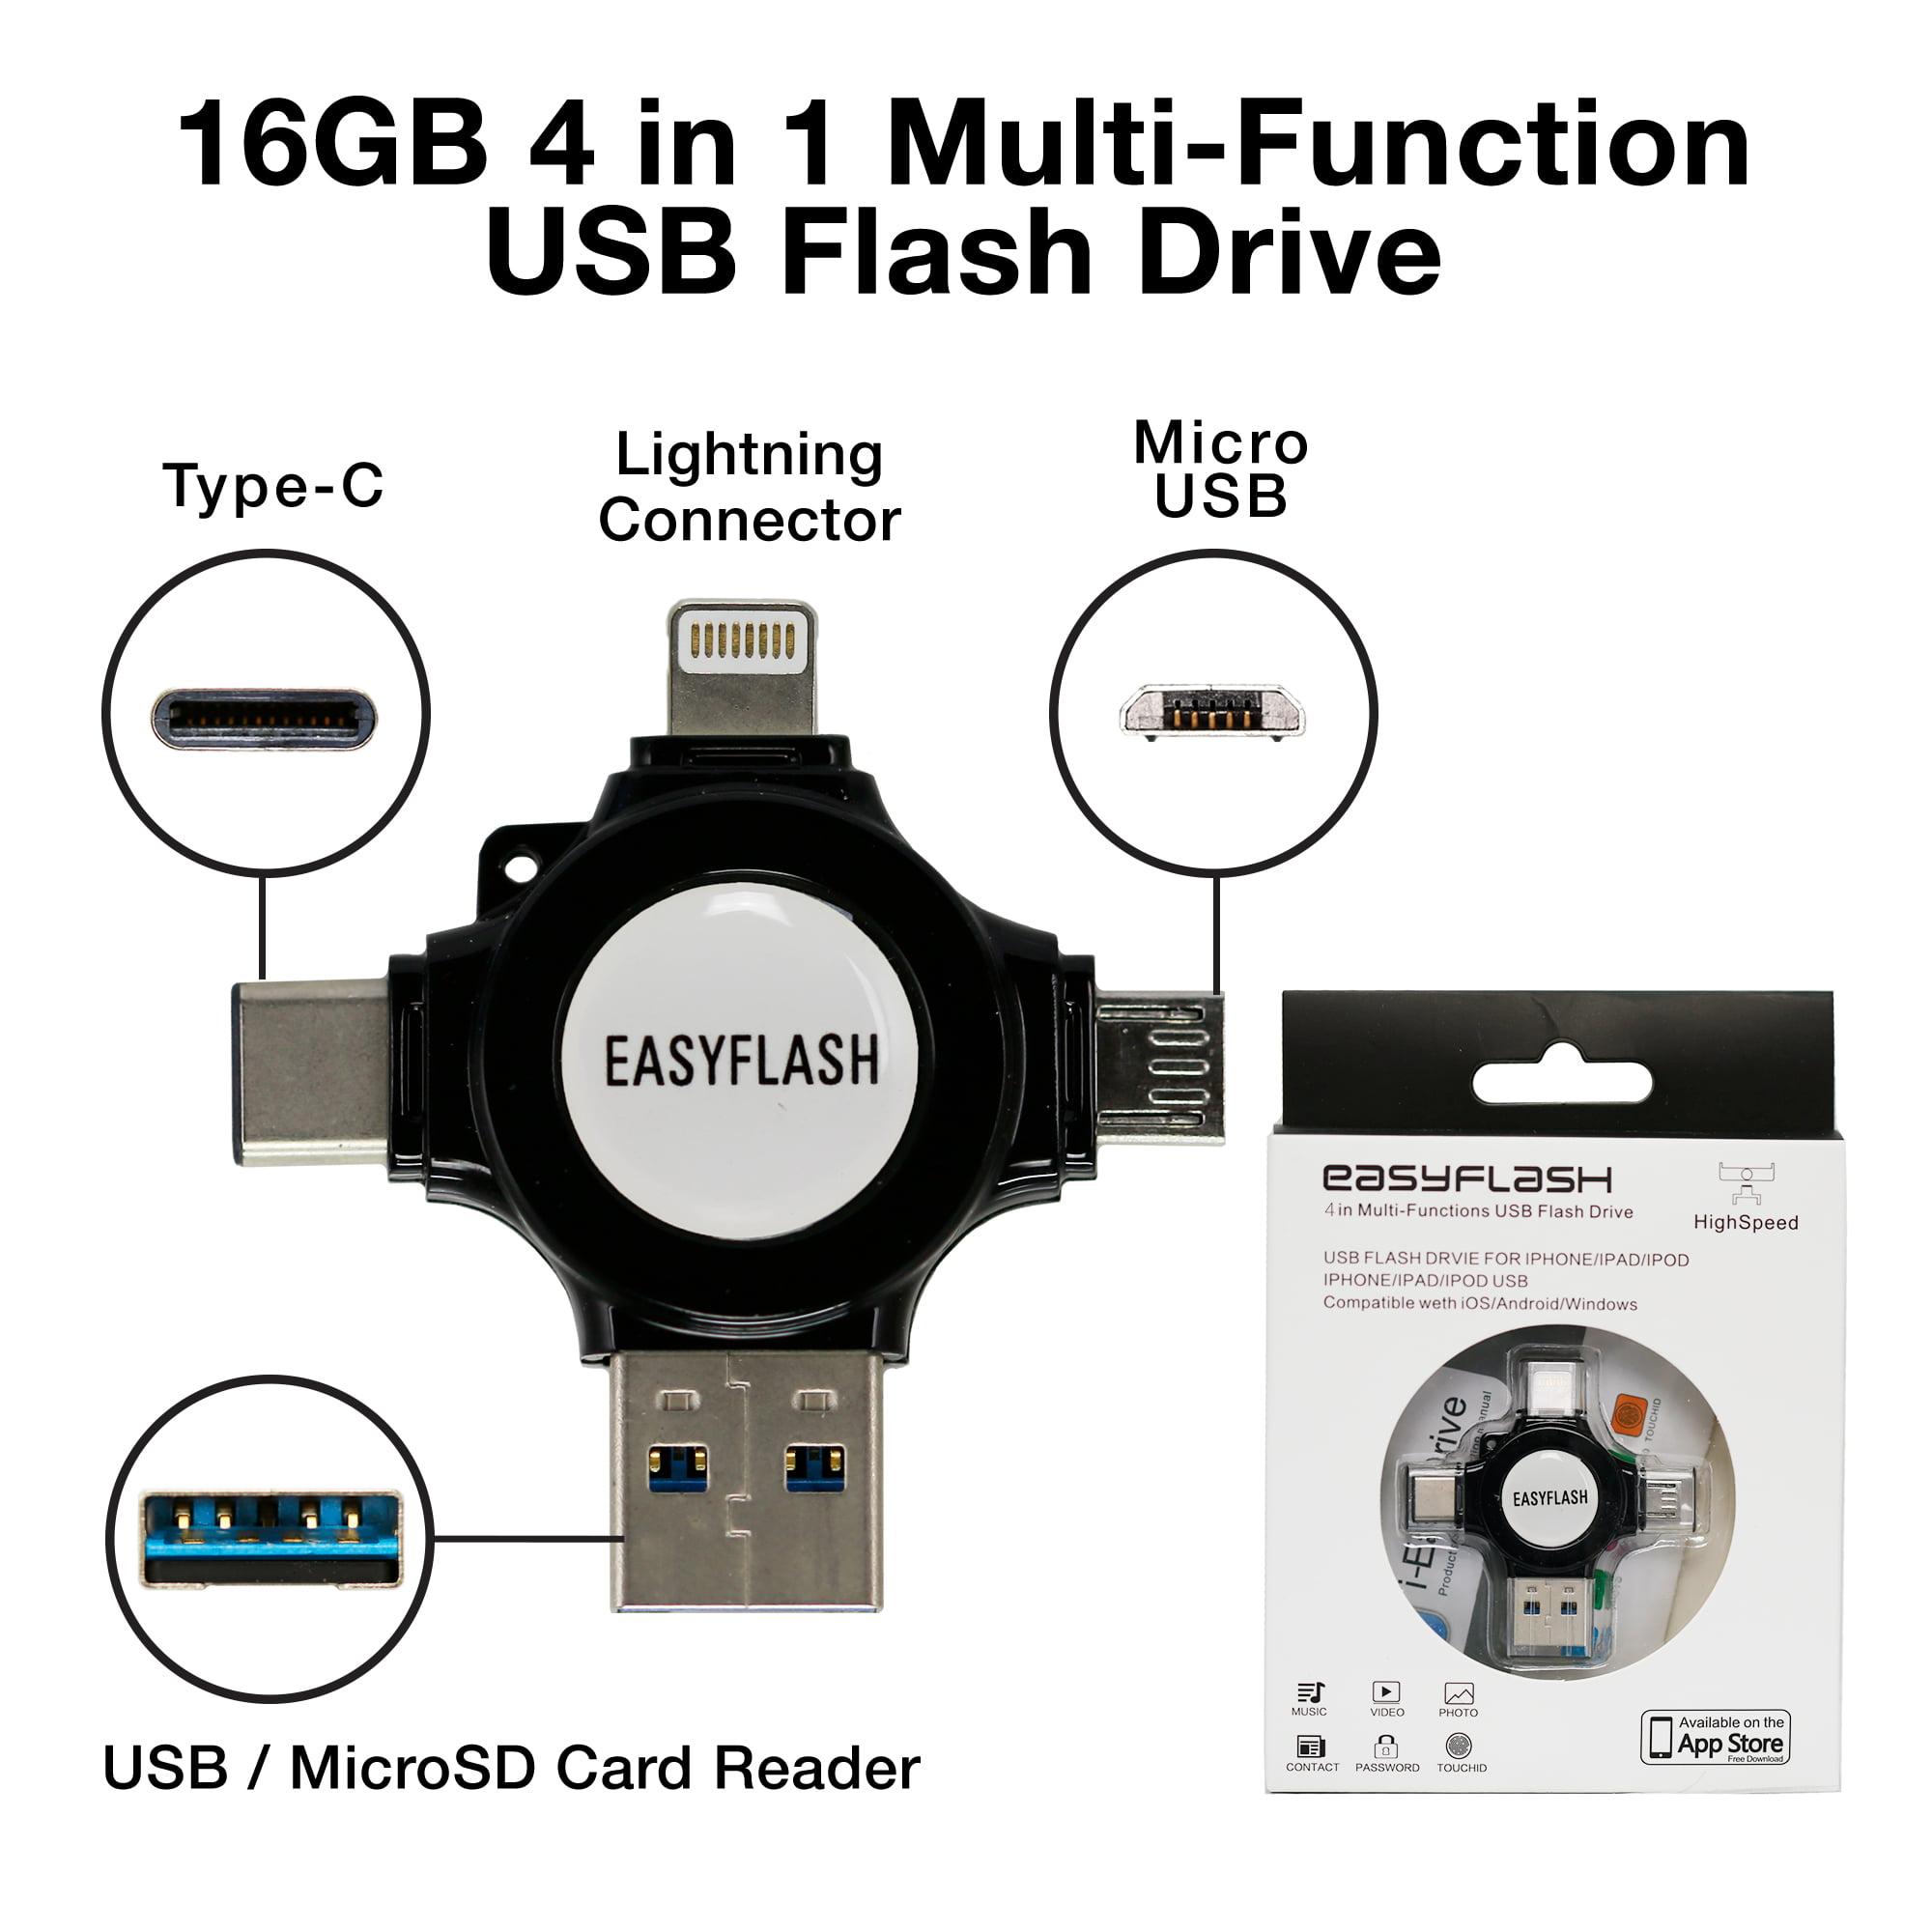 4in1 (Type C & Lightning & MicroUSB & USB3.0/MicroSD Card Reader) Multi-Function USB Flash Drive - (16GB) Black